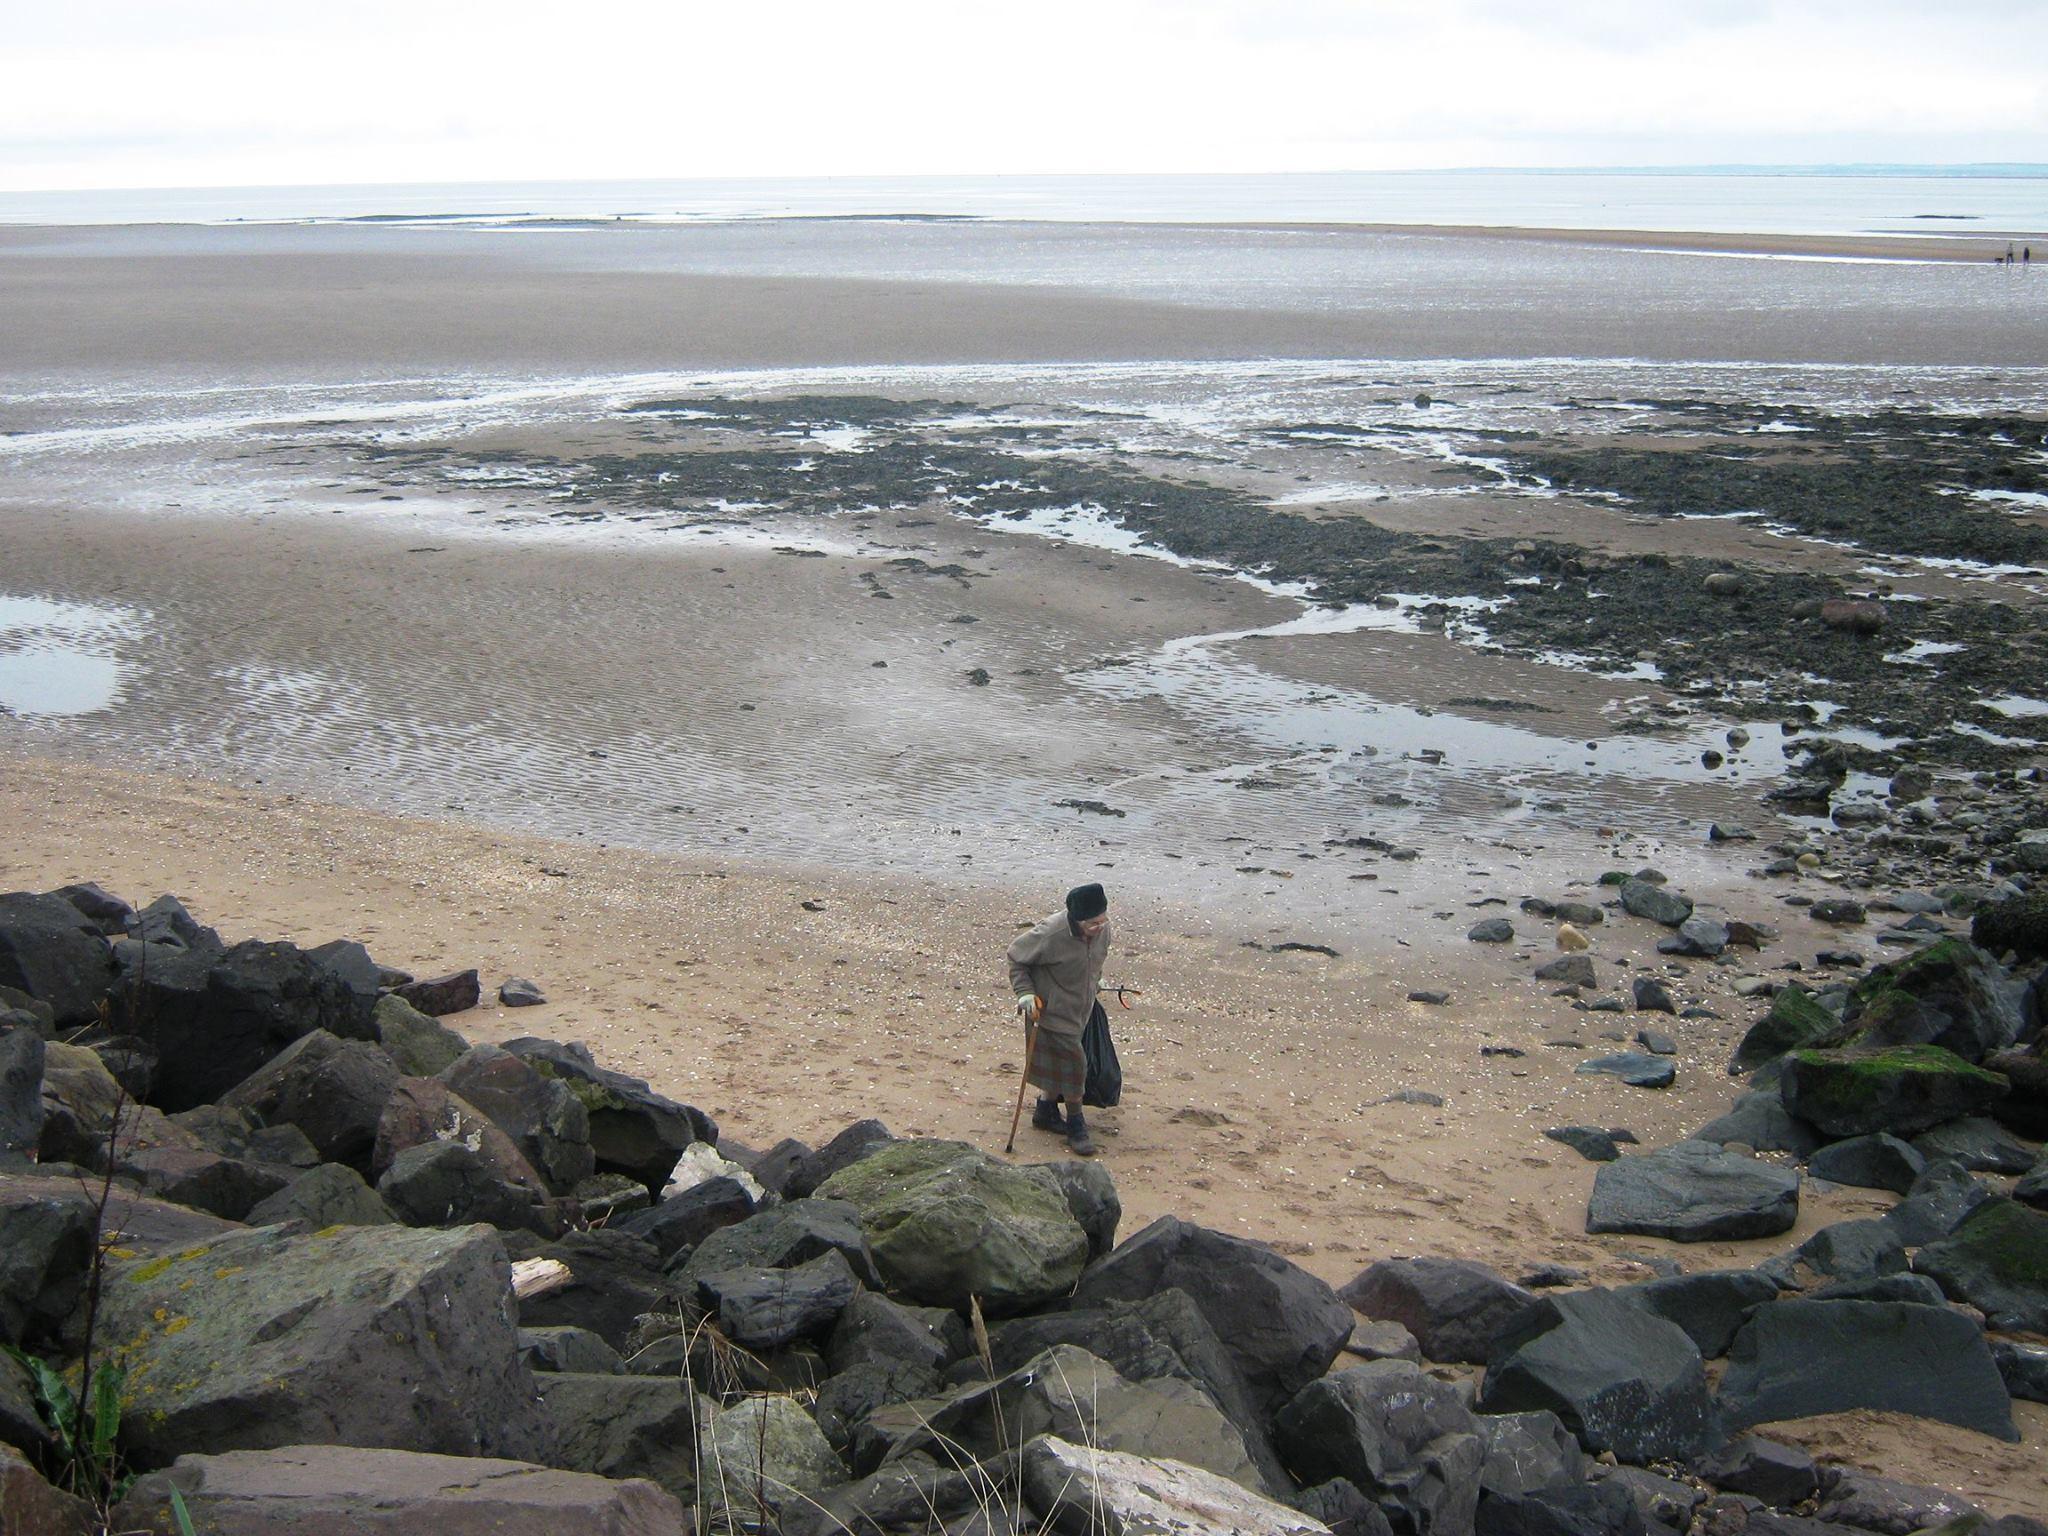 A volunteer helping to clean up Monifieth beach.